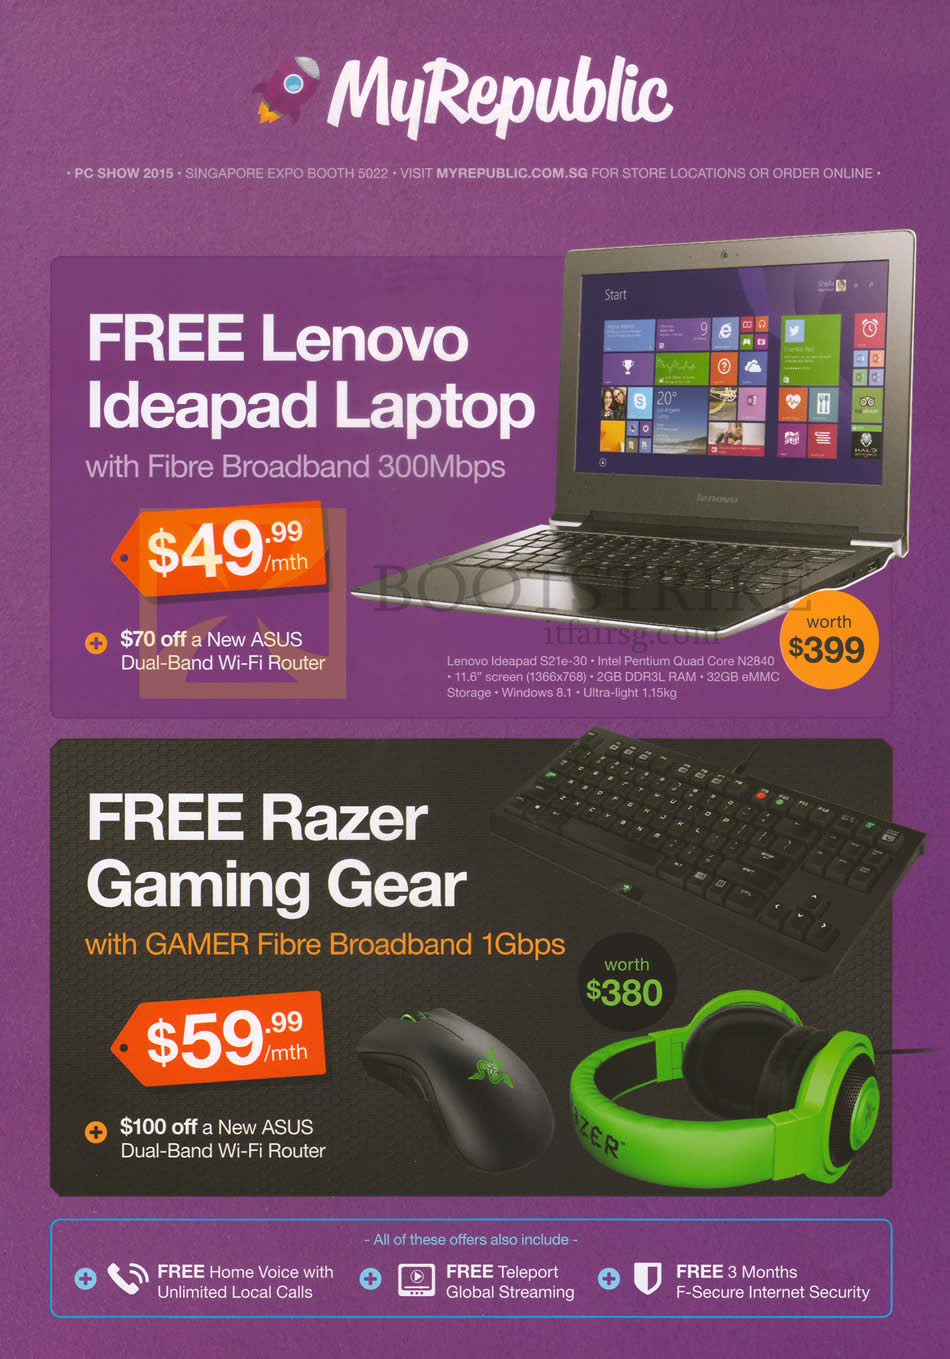 PC SHOW 2015 price list image brochure of MyRepublic Fibre Broadband 300Mbps 49.99. Gamer Fibre Broadband 1Gbps 59.99